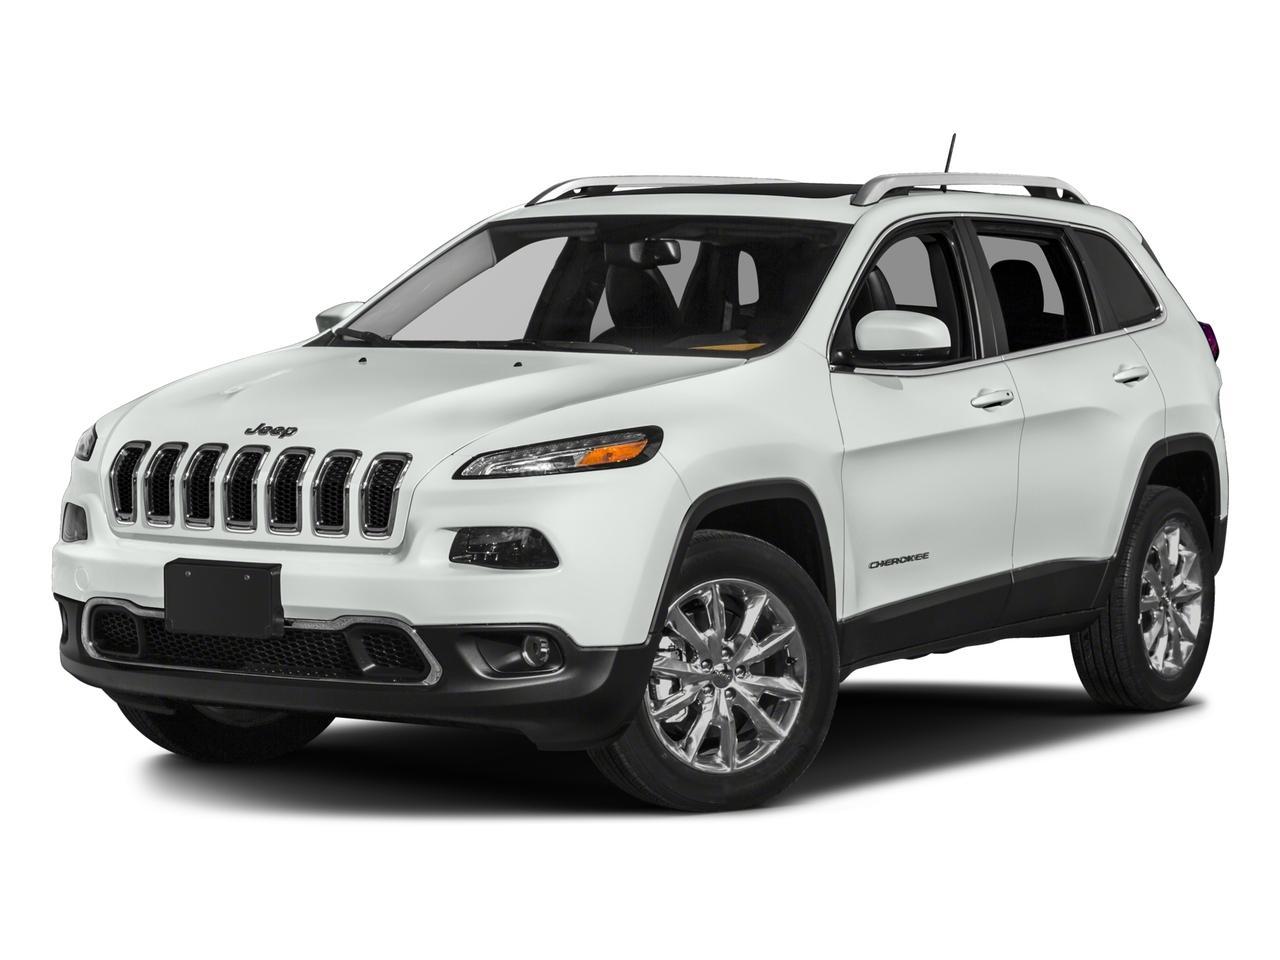 2018 Jeep Cherokee Vehicle Photo in Nashua, NH 03060